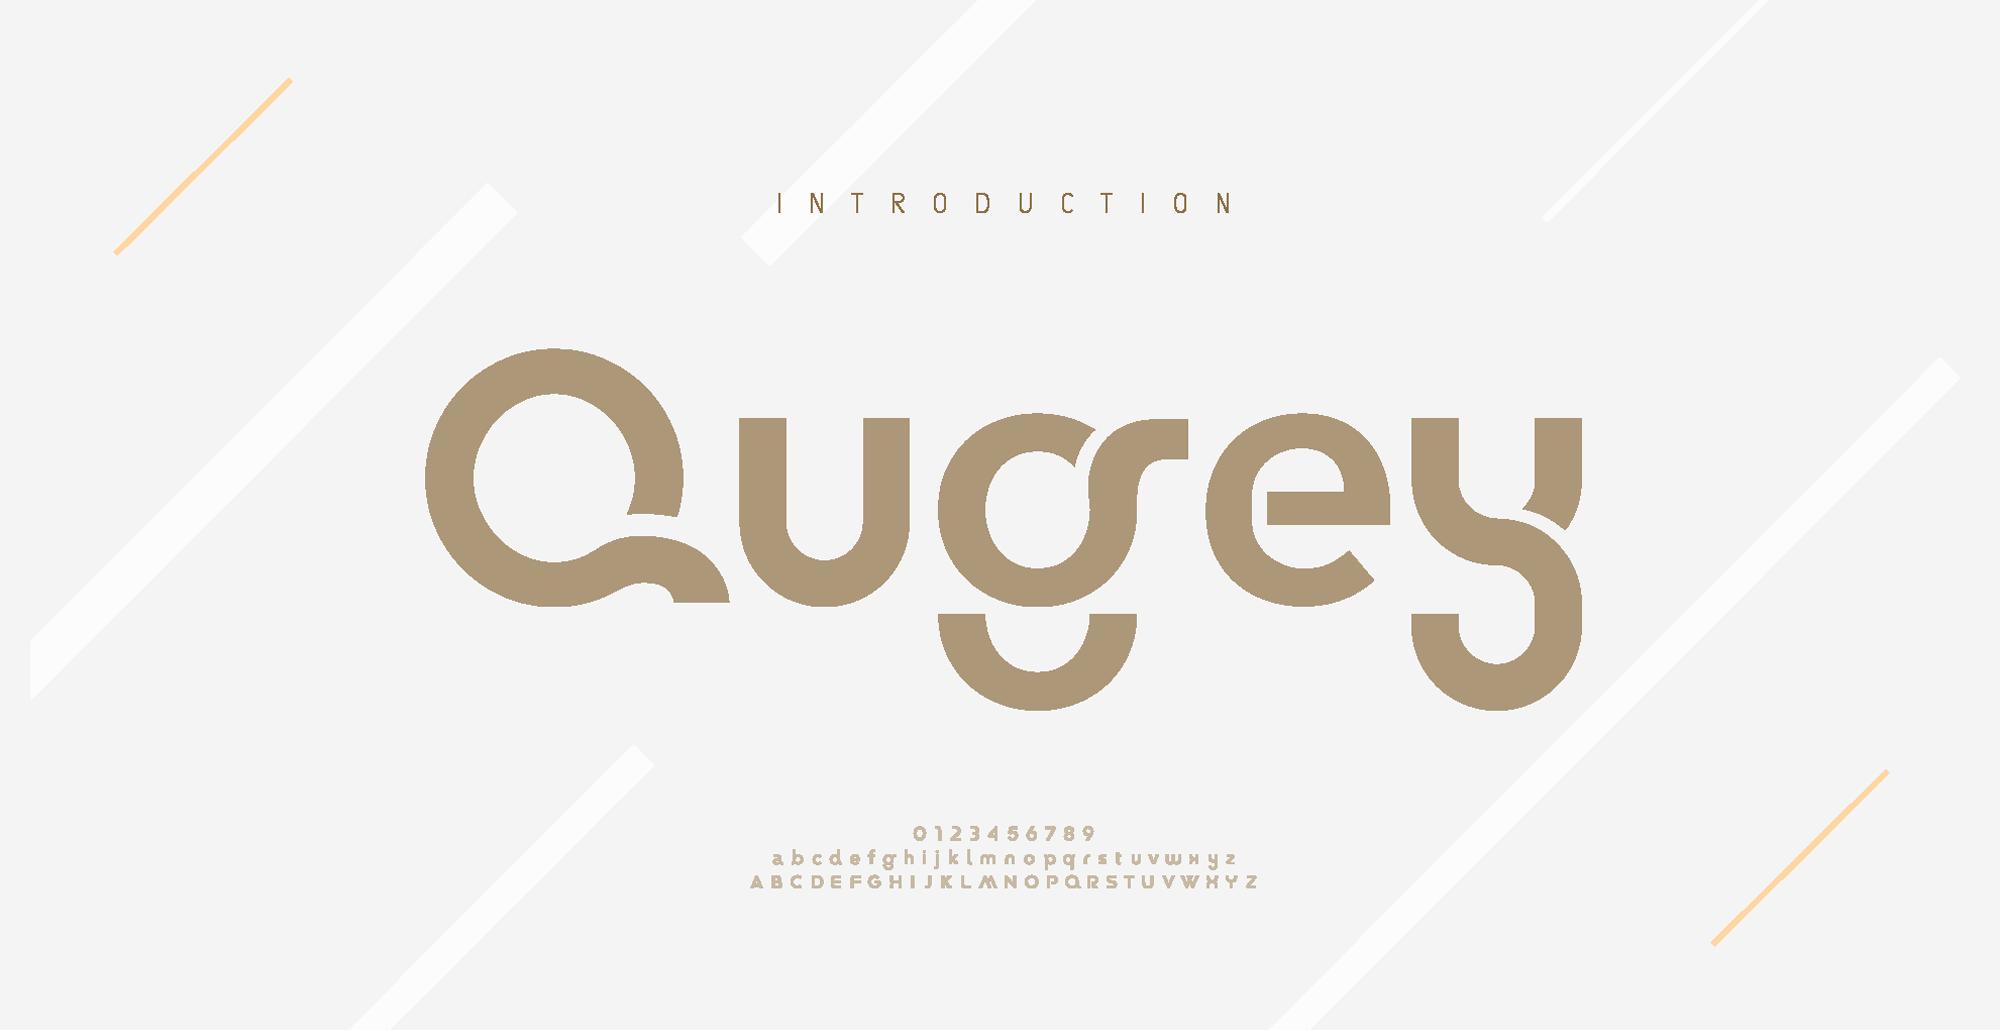 دانلود فونت تایپوگرافی انگلیسی Qugey